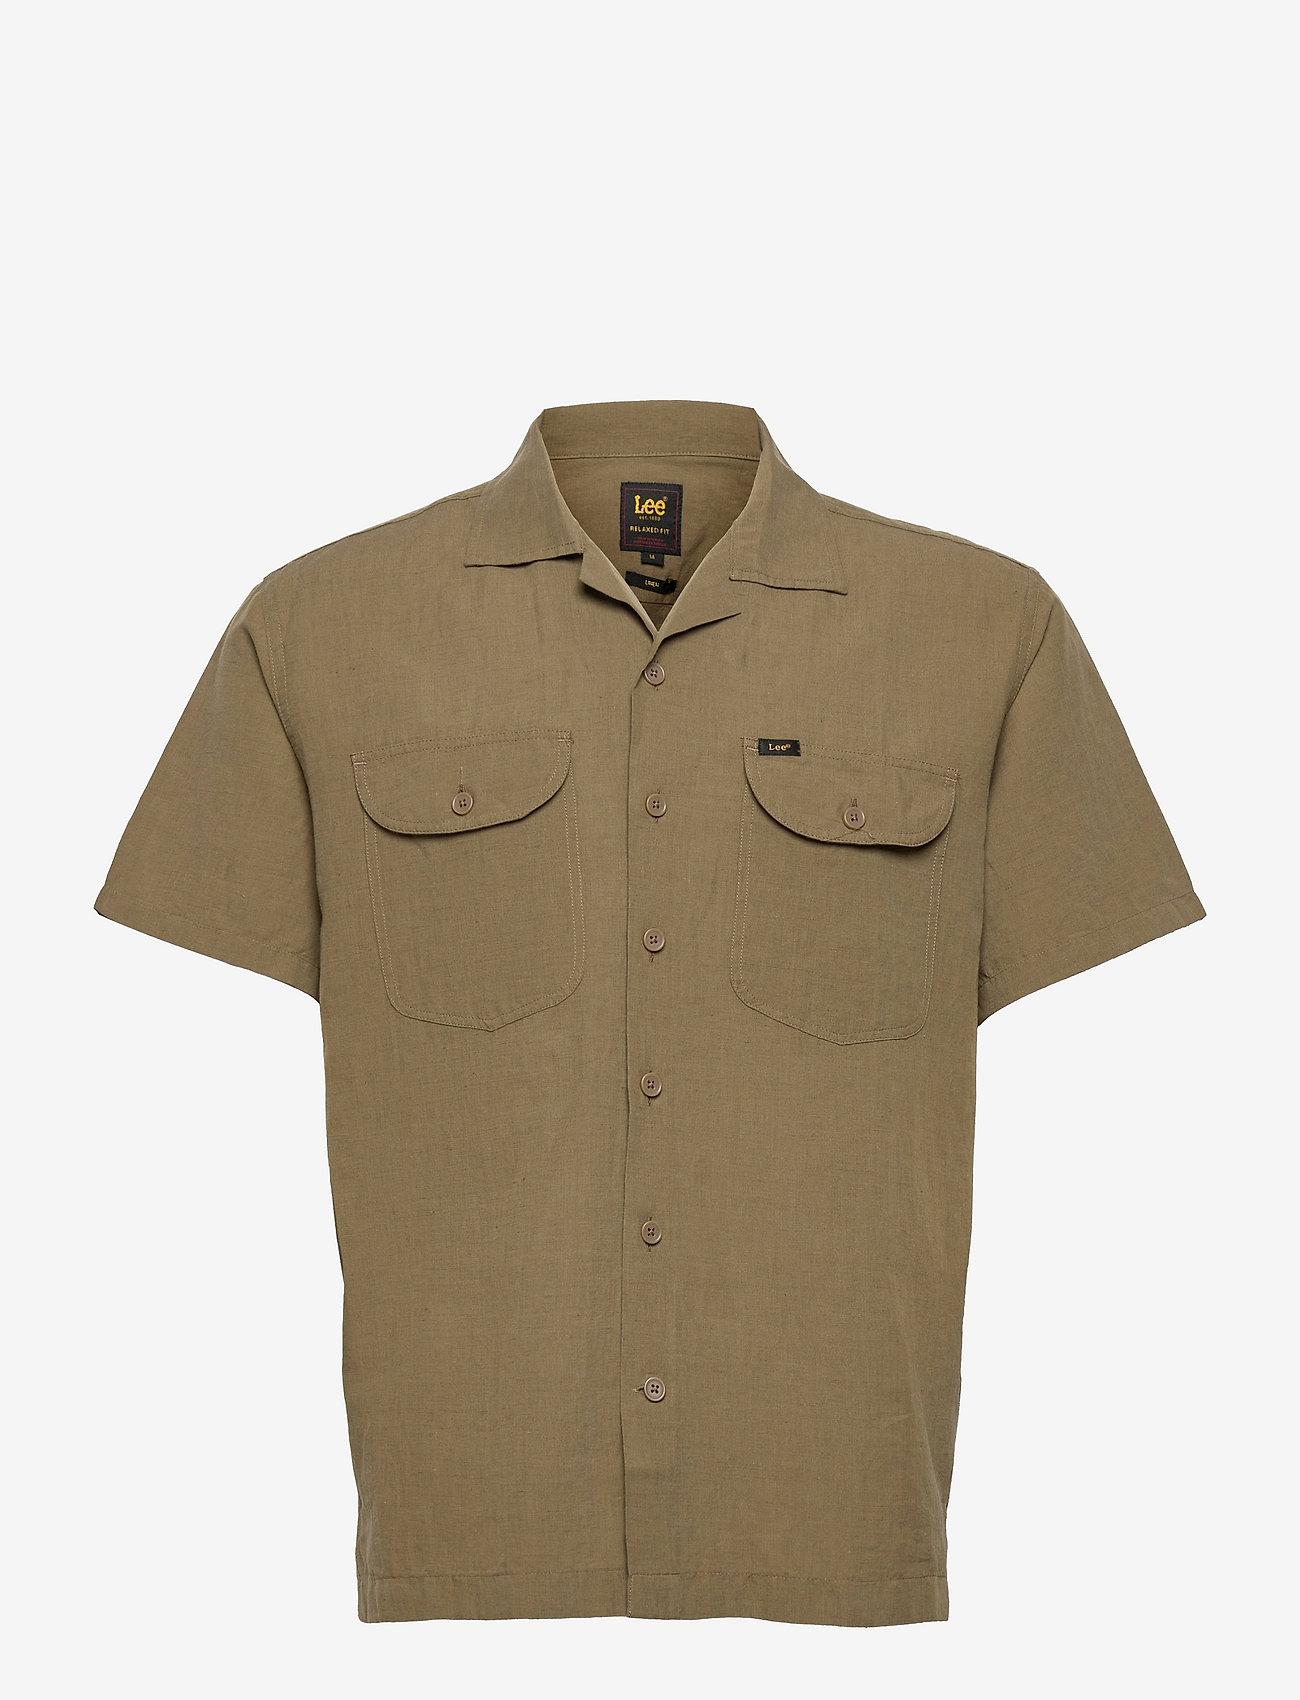 Lee Jeans - SS WORKER SHIRT - basic shirts - cloude dancer - 0